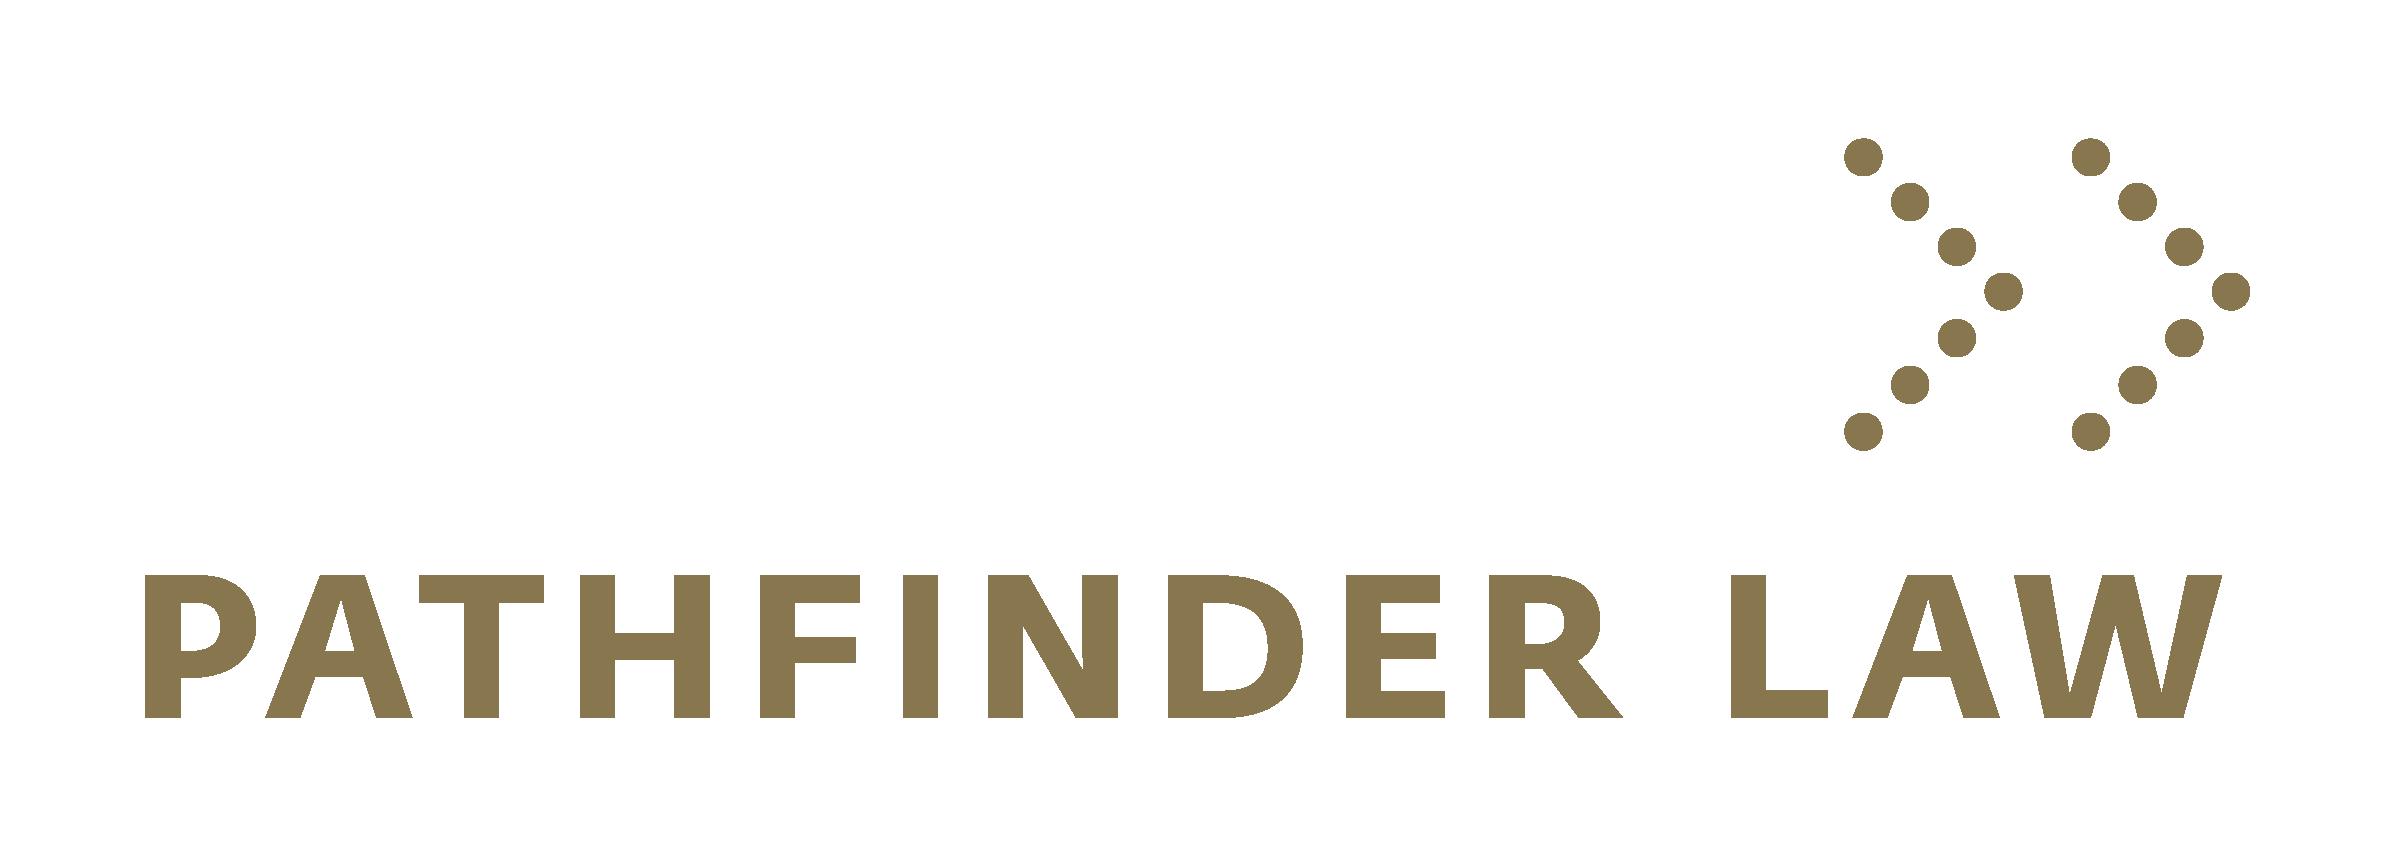 Pathfinder Law Logo